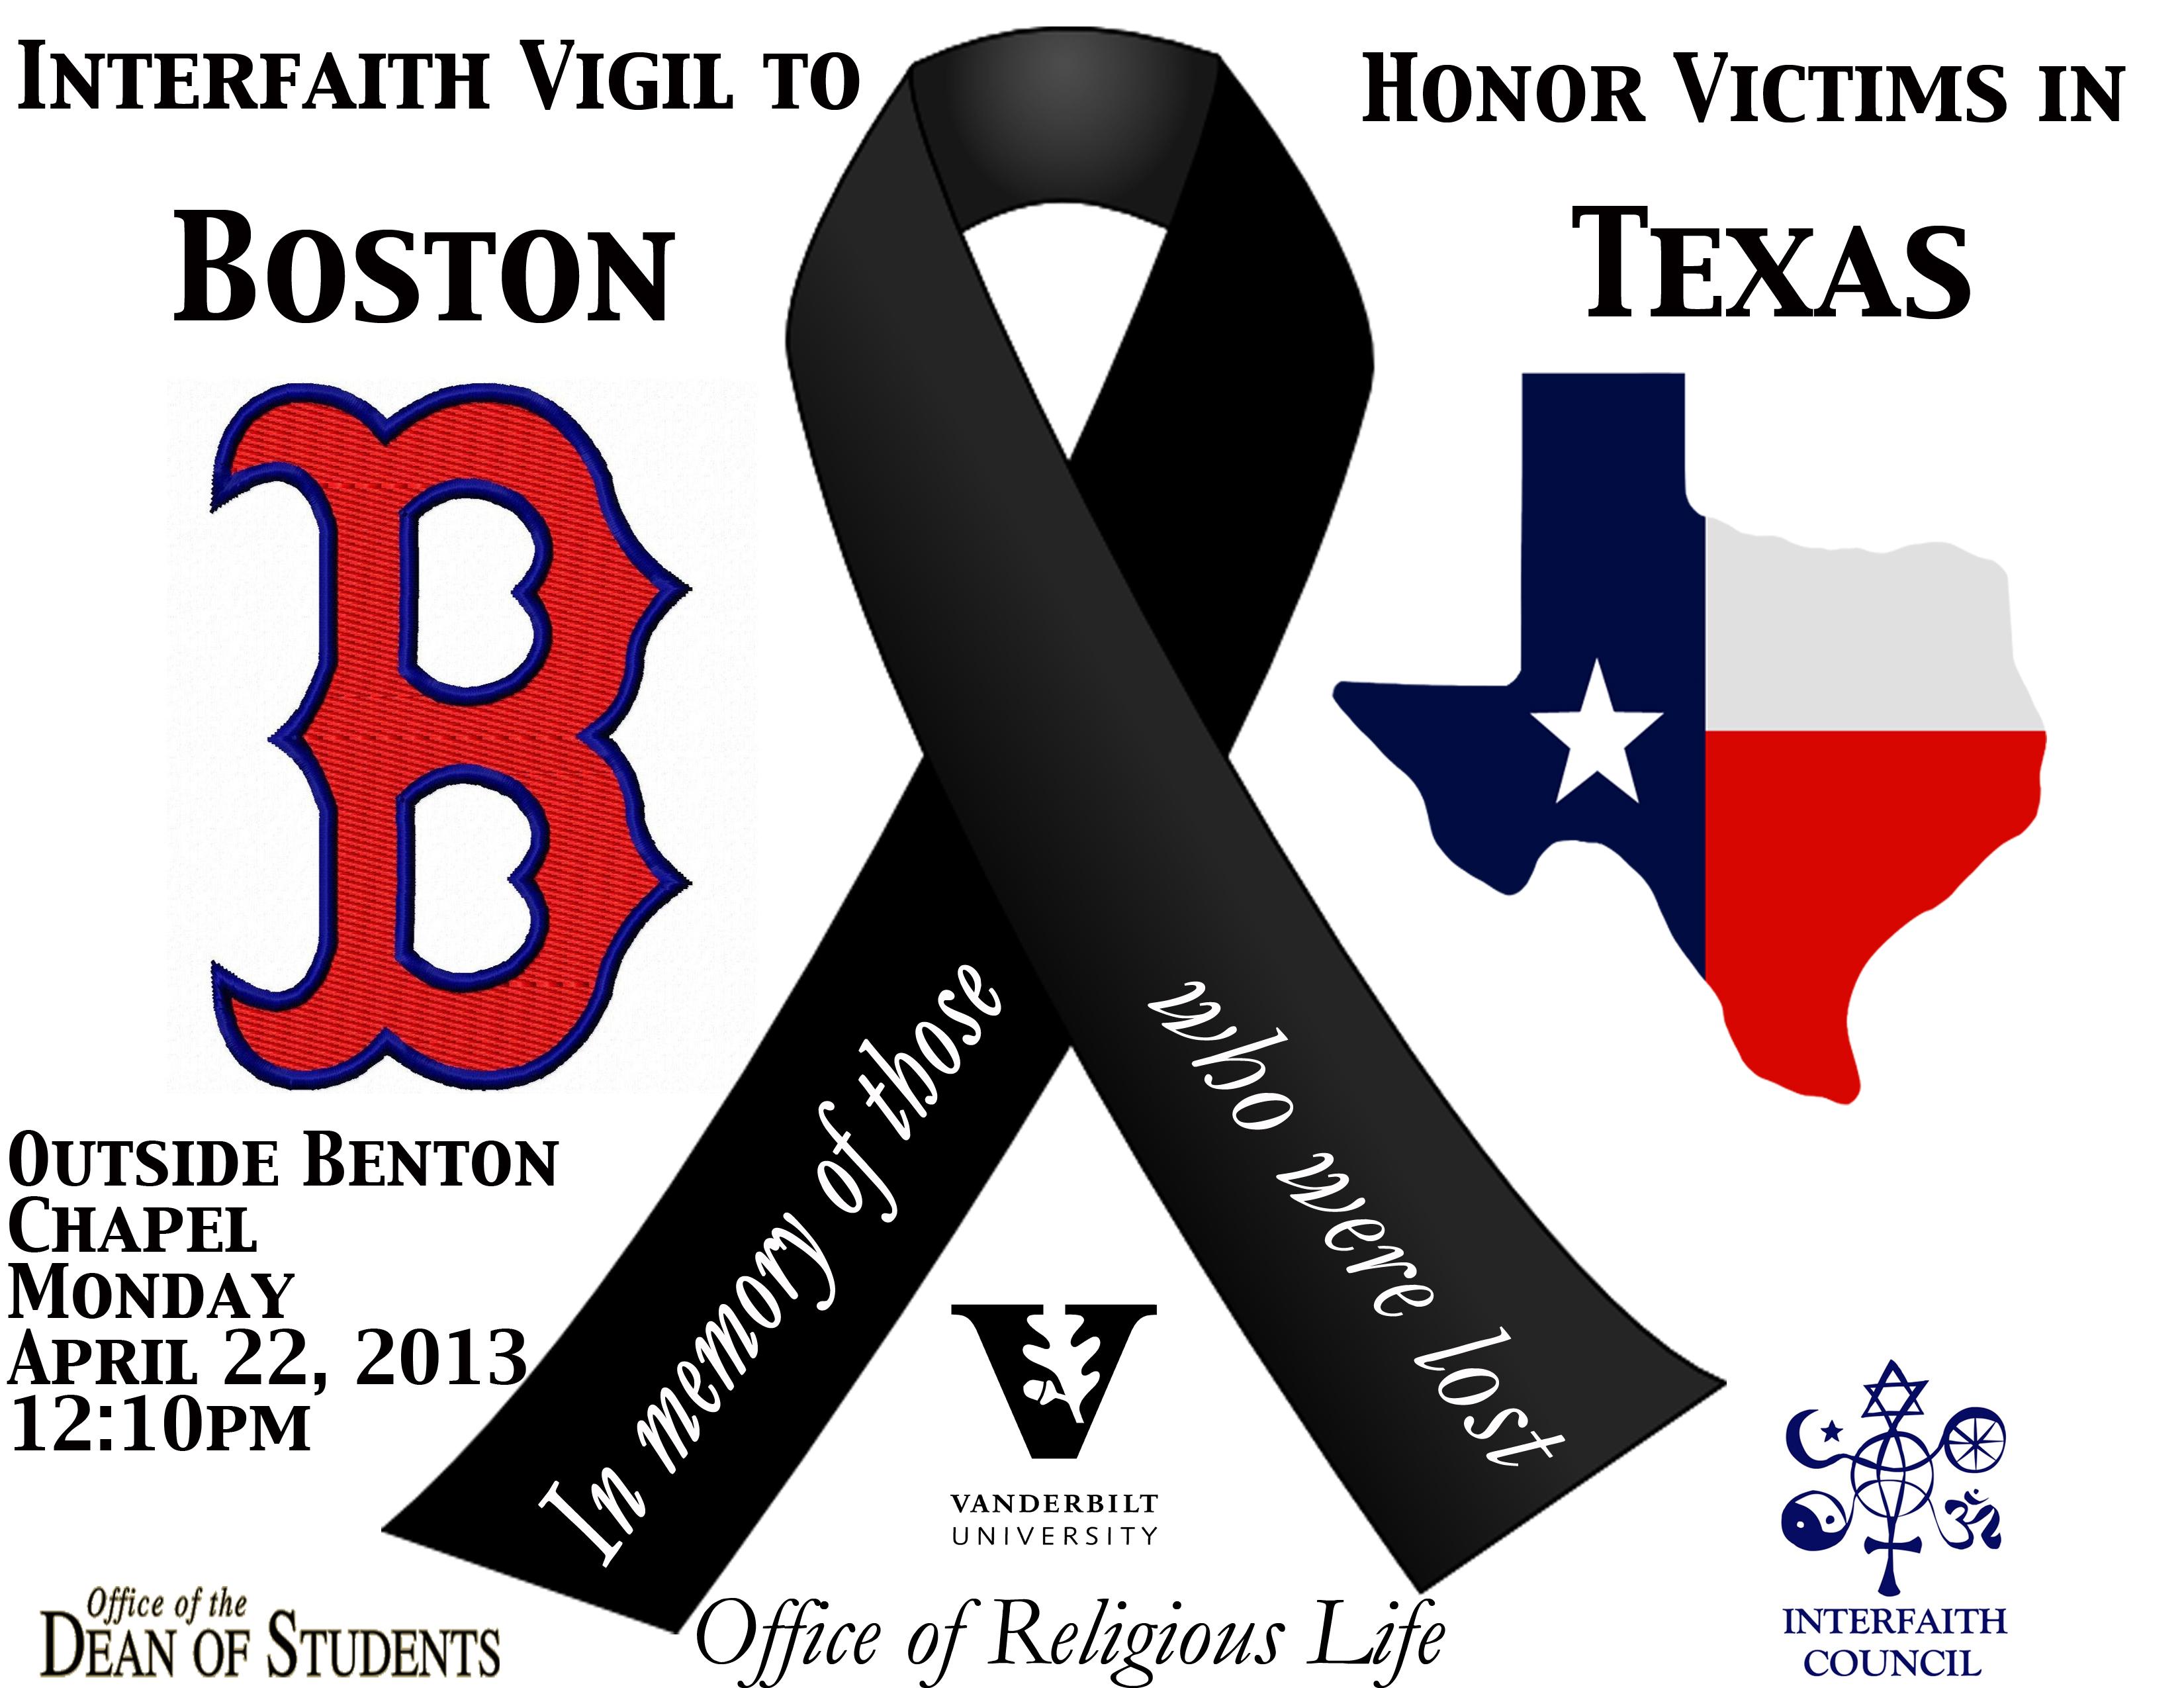 Vigil Poster1.2